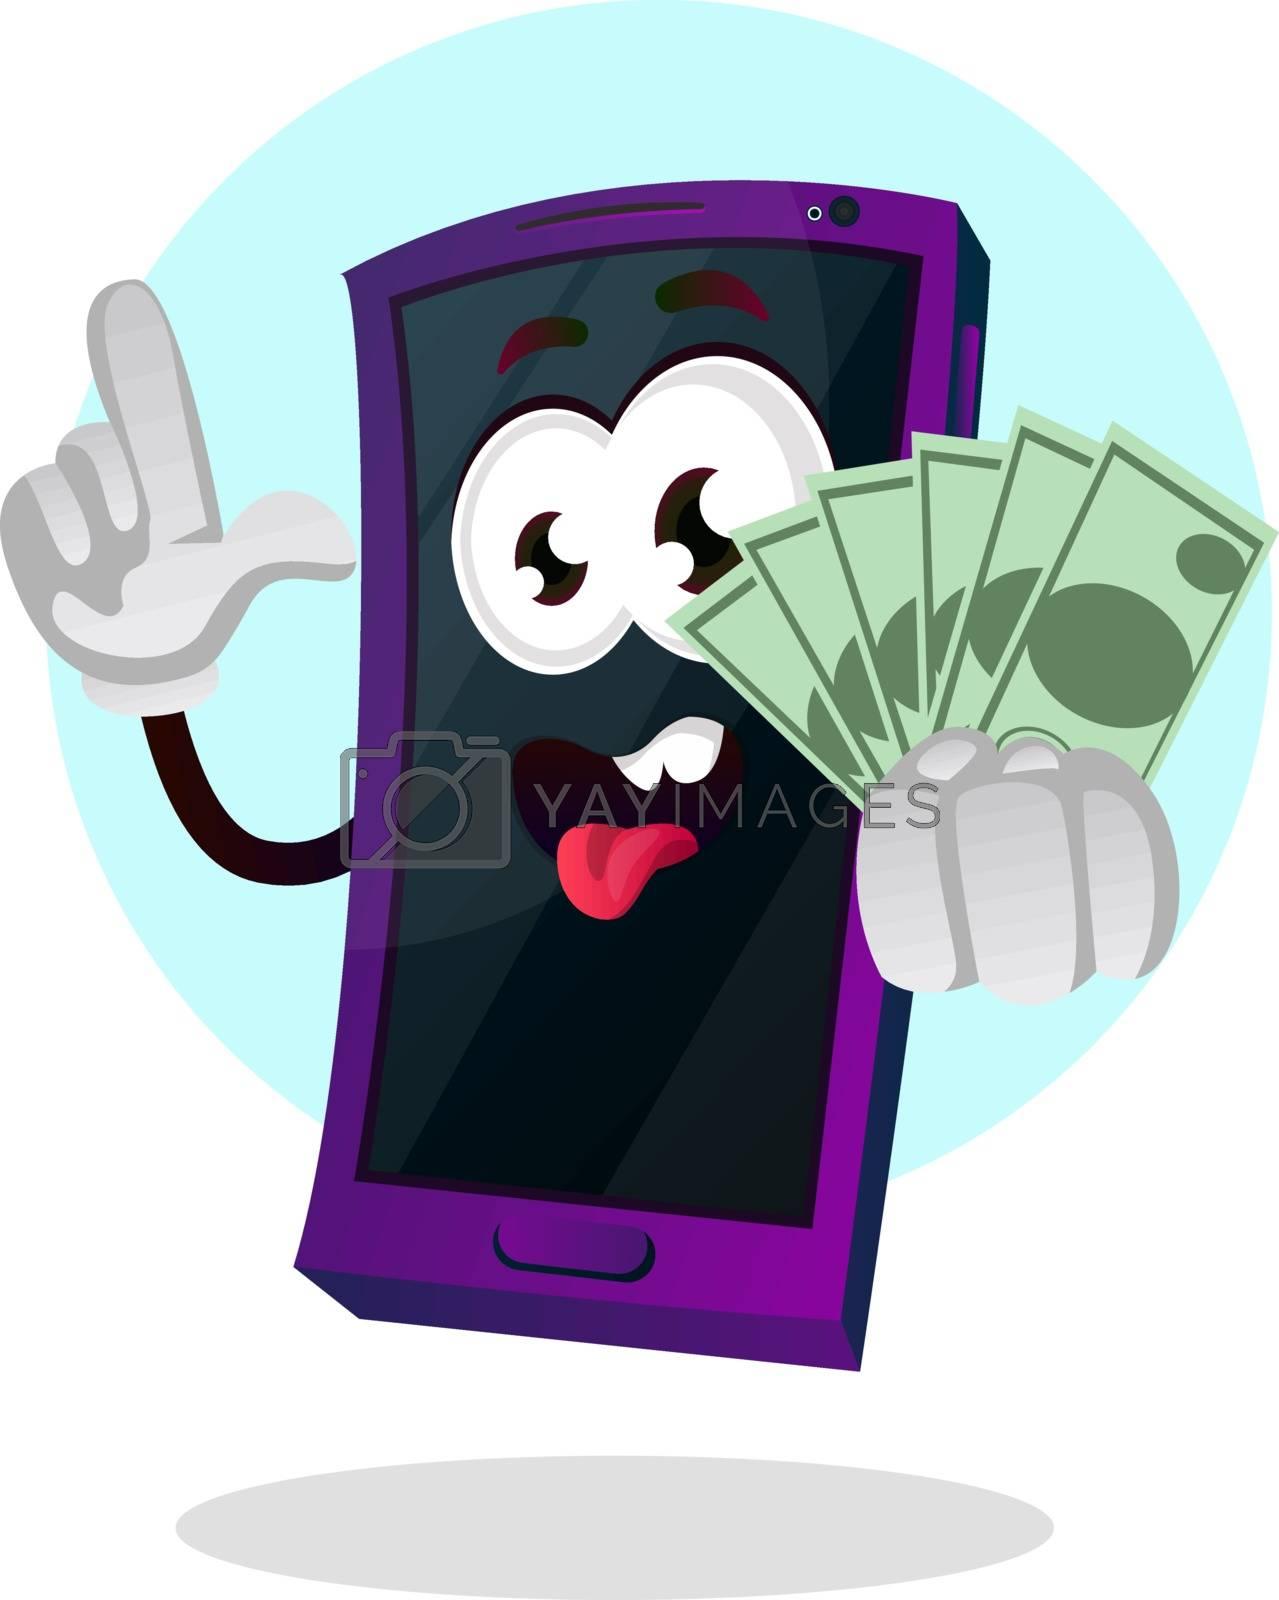 Royalty free image of Mobile phone emoji holding money illustration vector on white ba by Morphart